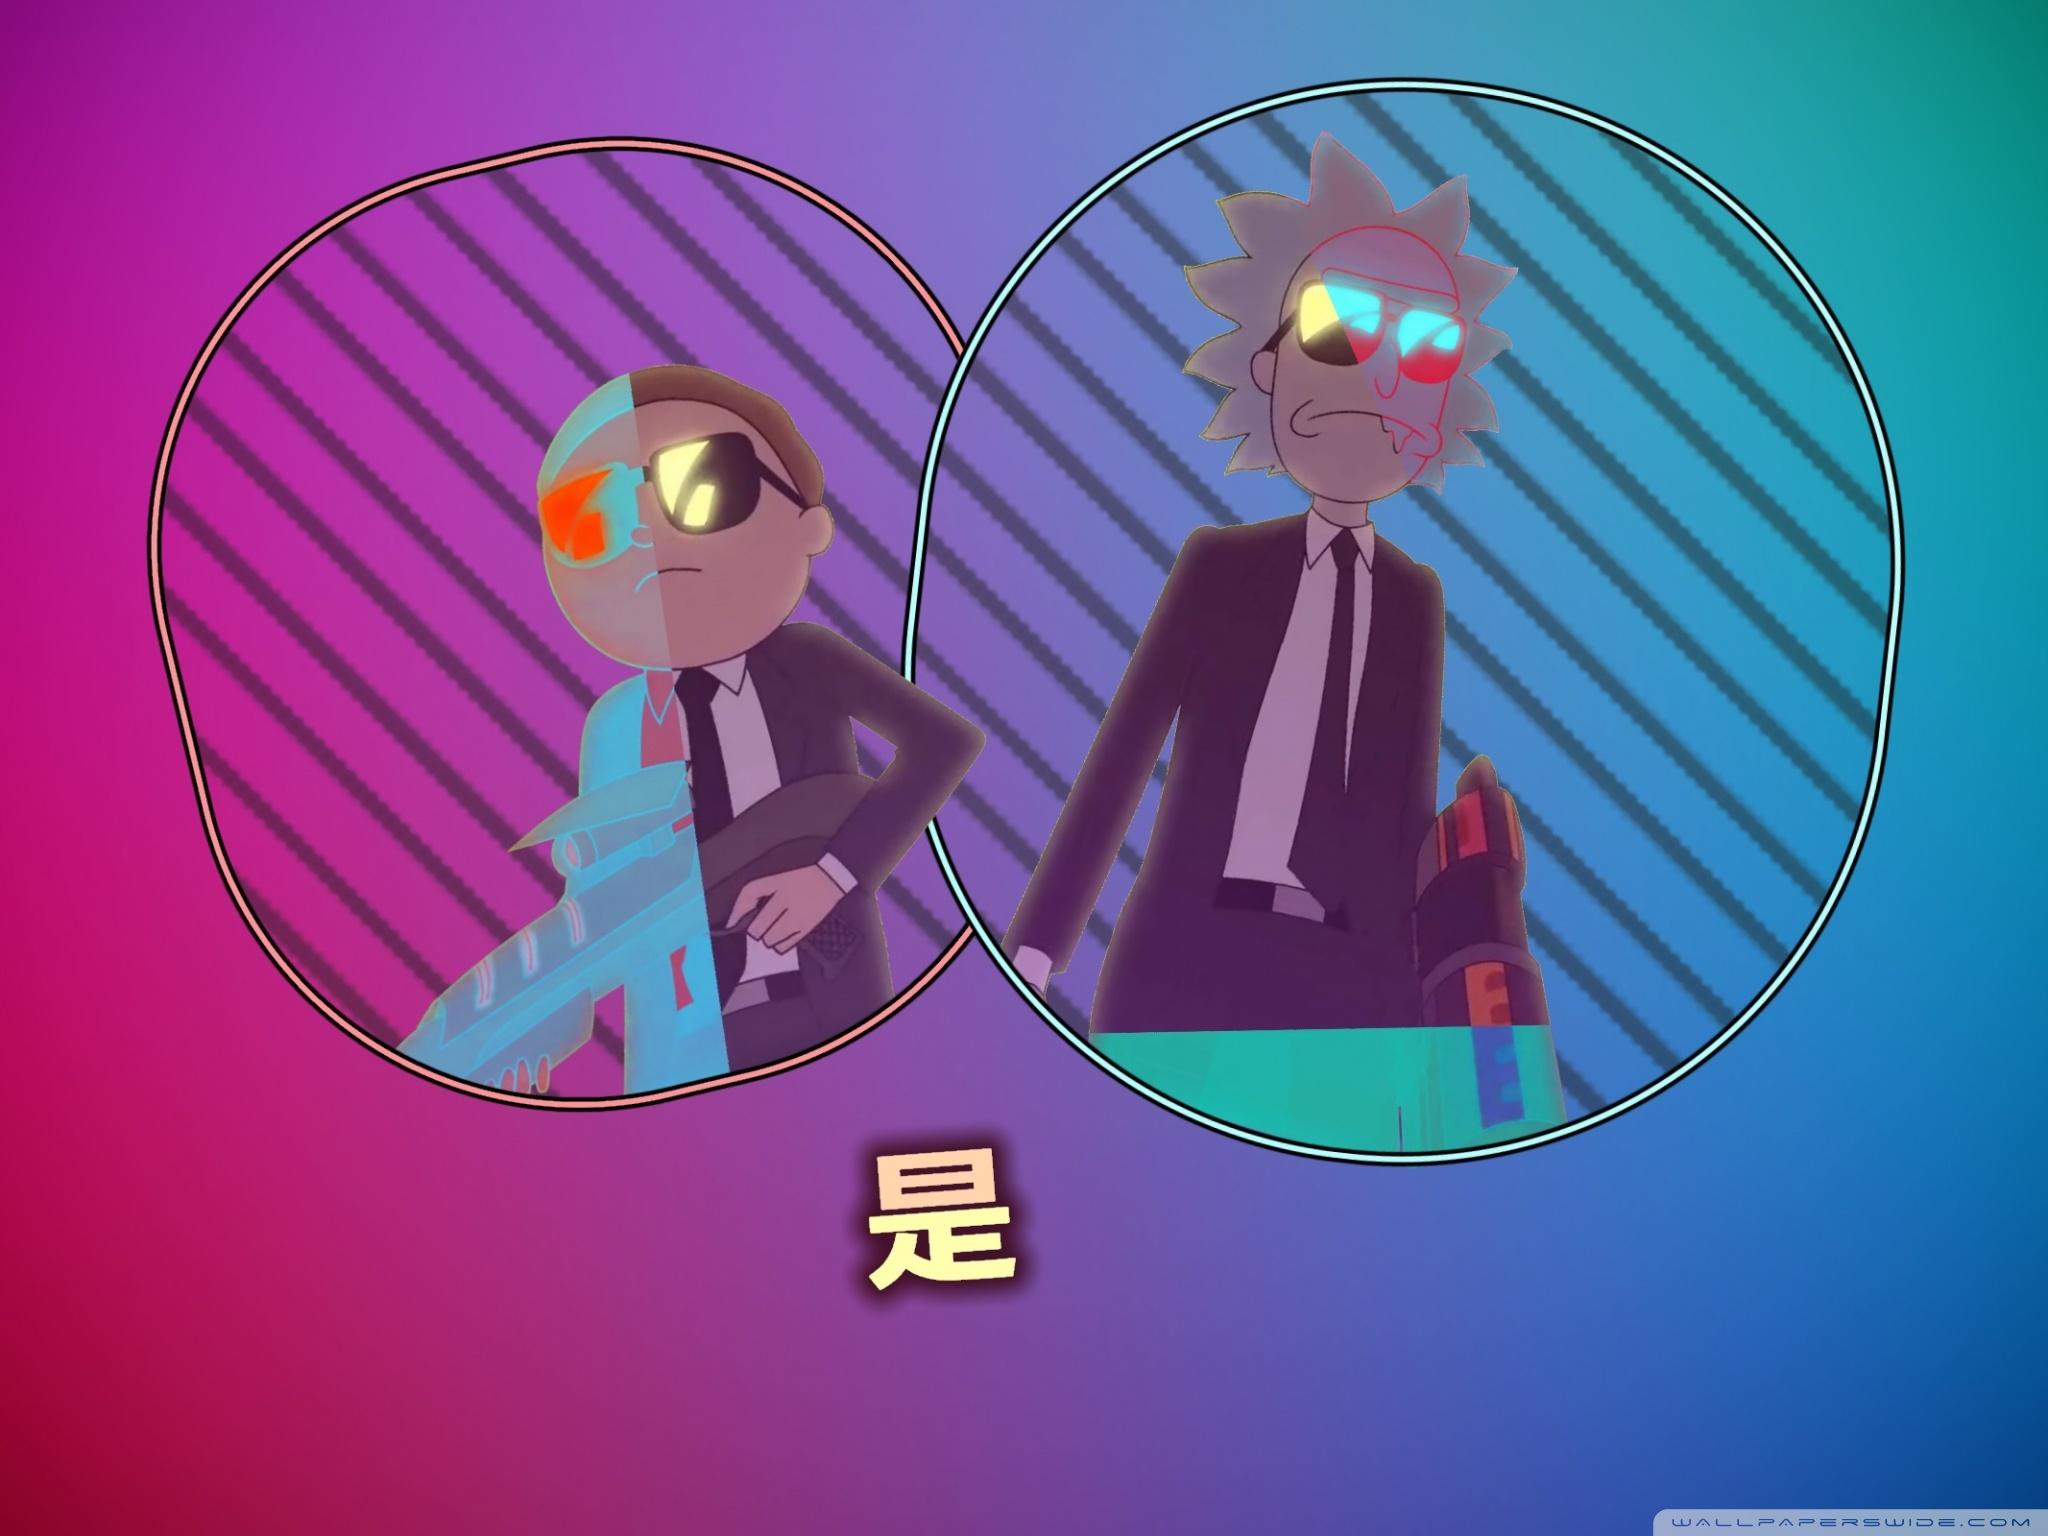 download Rick And Morty Retro 2048x1536 Wallpaper Ecopetitcat 2048x1536